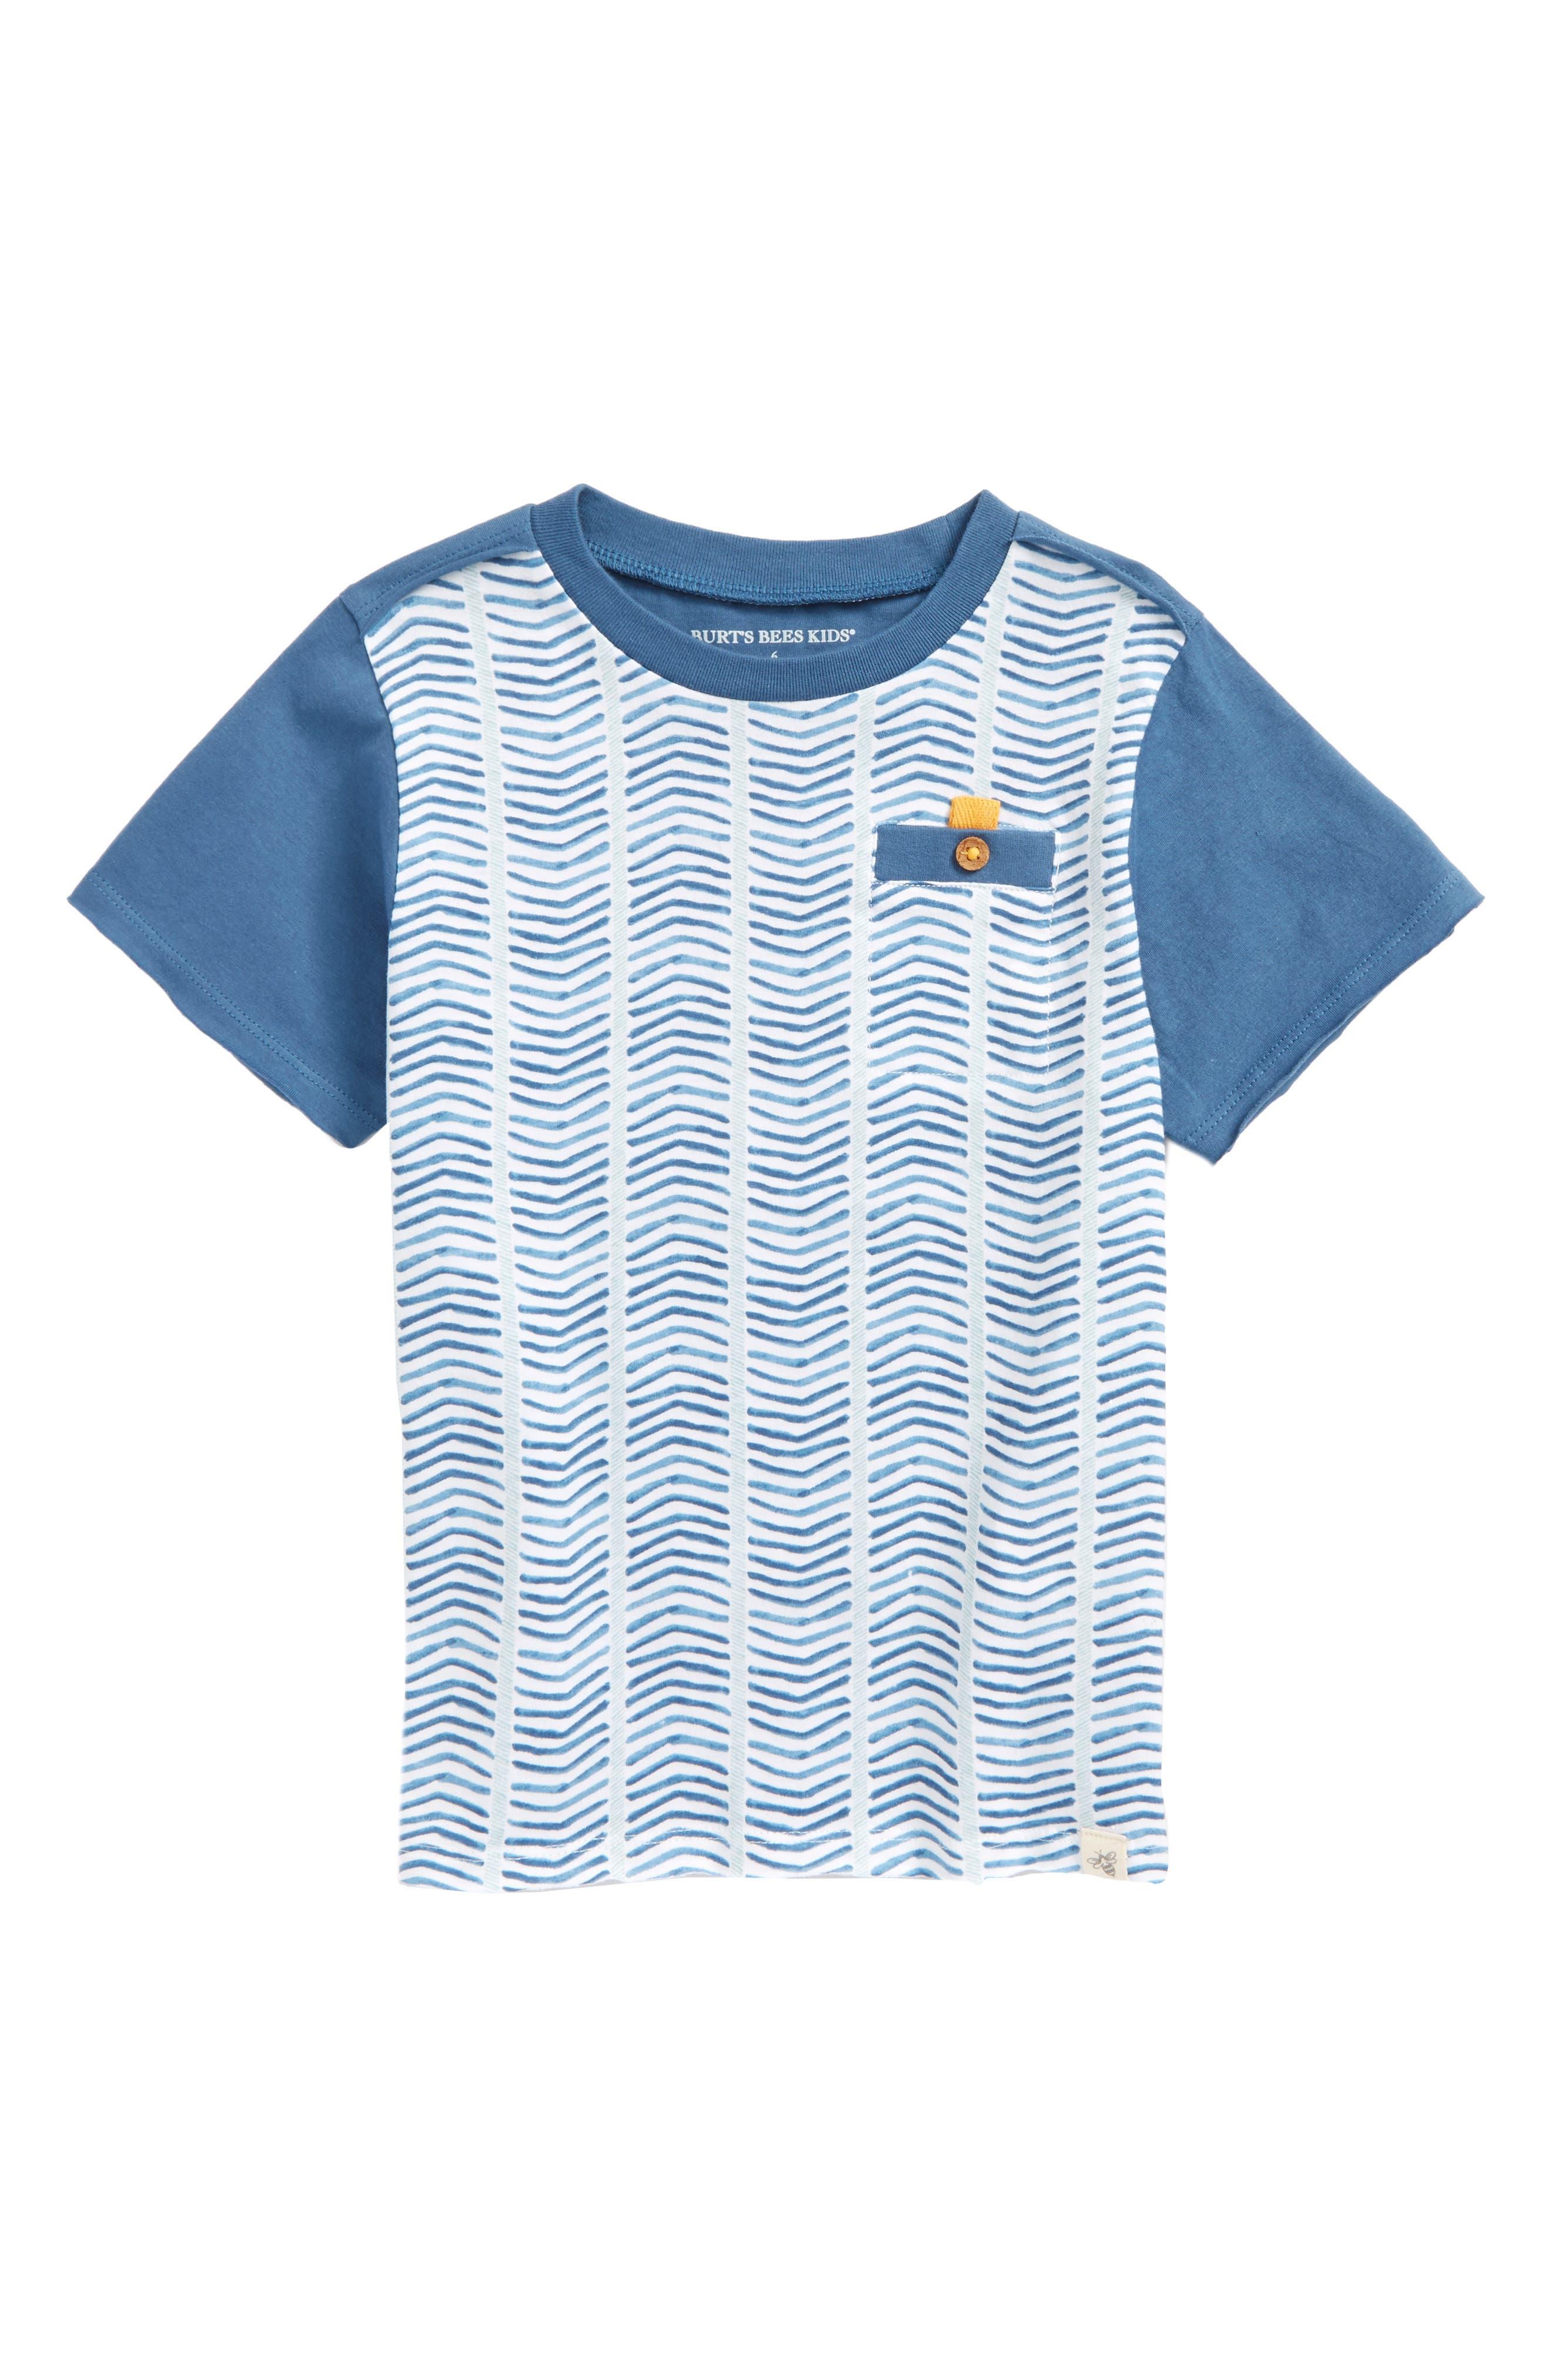 Chevron Stripe Organic Cotton T-Shirt,                             Main thumbnail 1, color,                             430